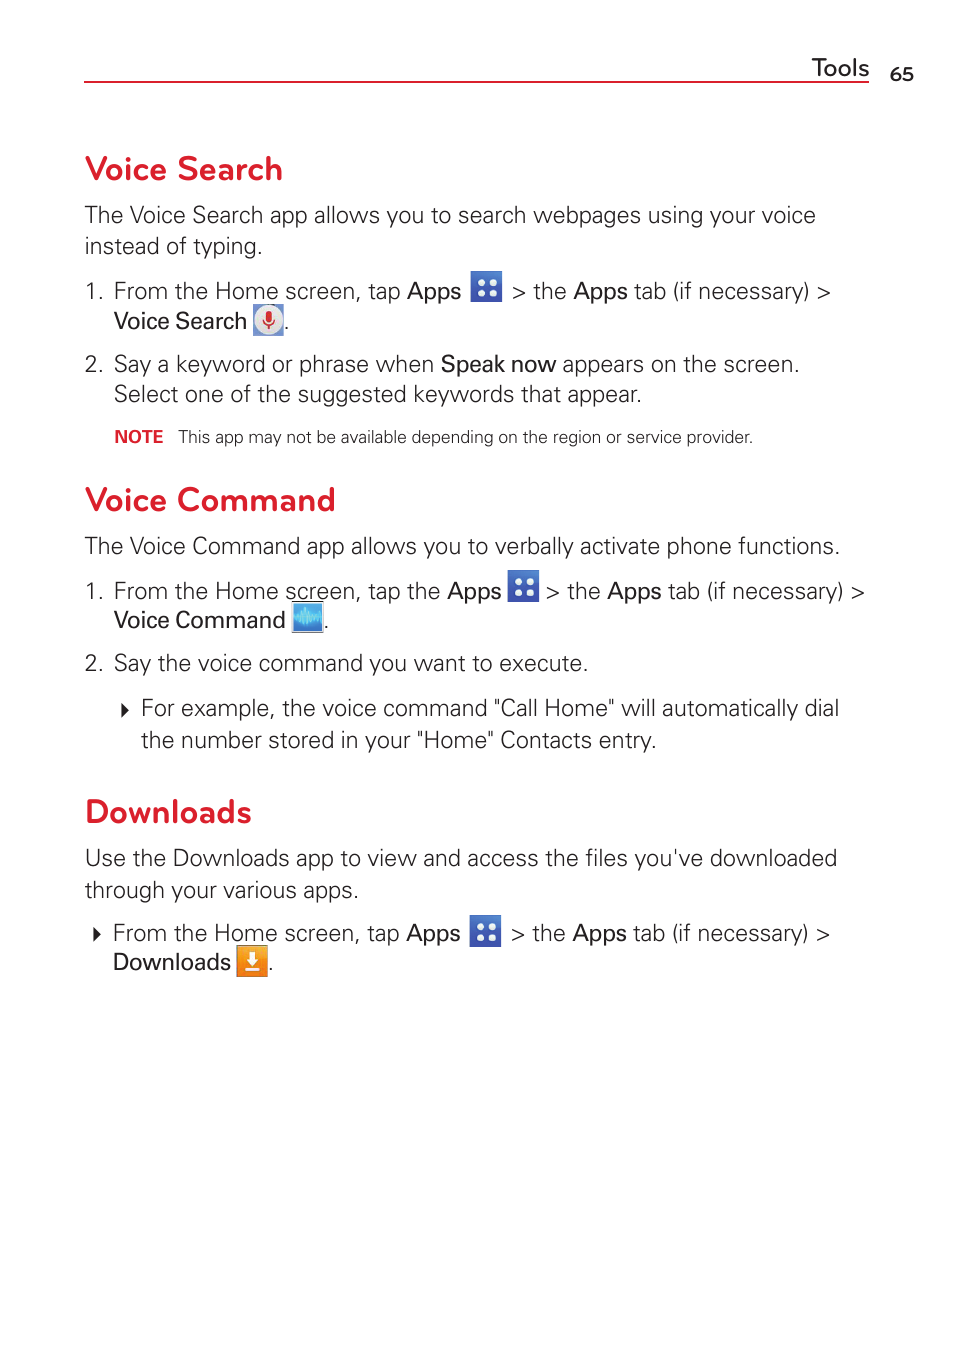 Voice search, Voice command, Downloads   LG VS415PP User